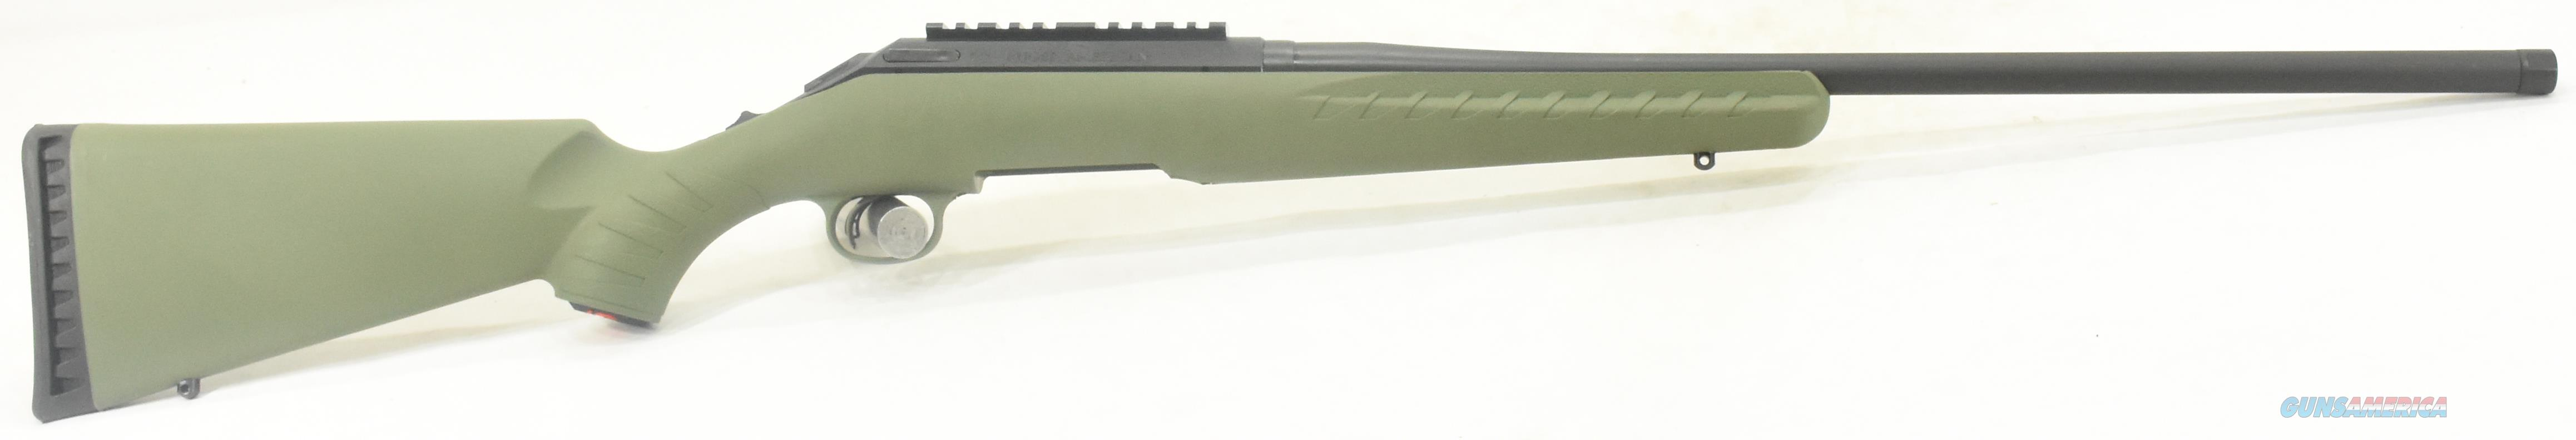 American Predator Green LH 243Win 22In 26916  Guns > Rifles > Ruger Rifles > American Rifle